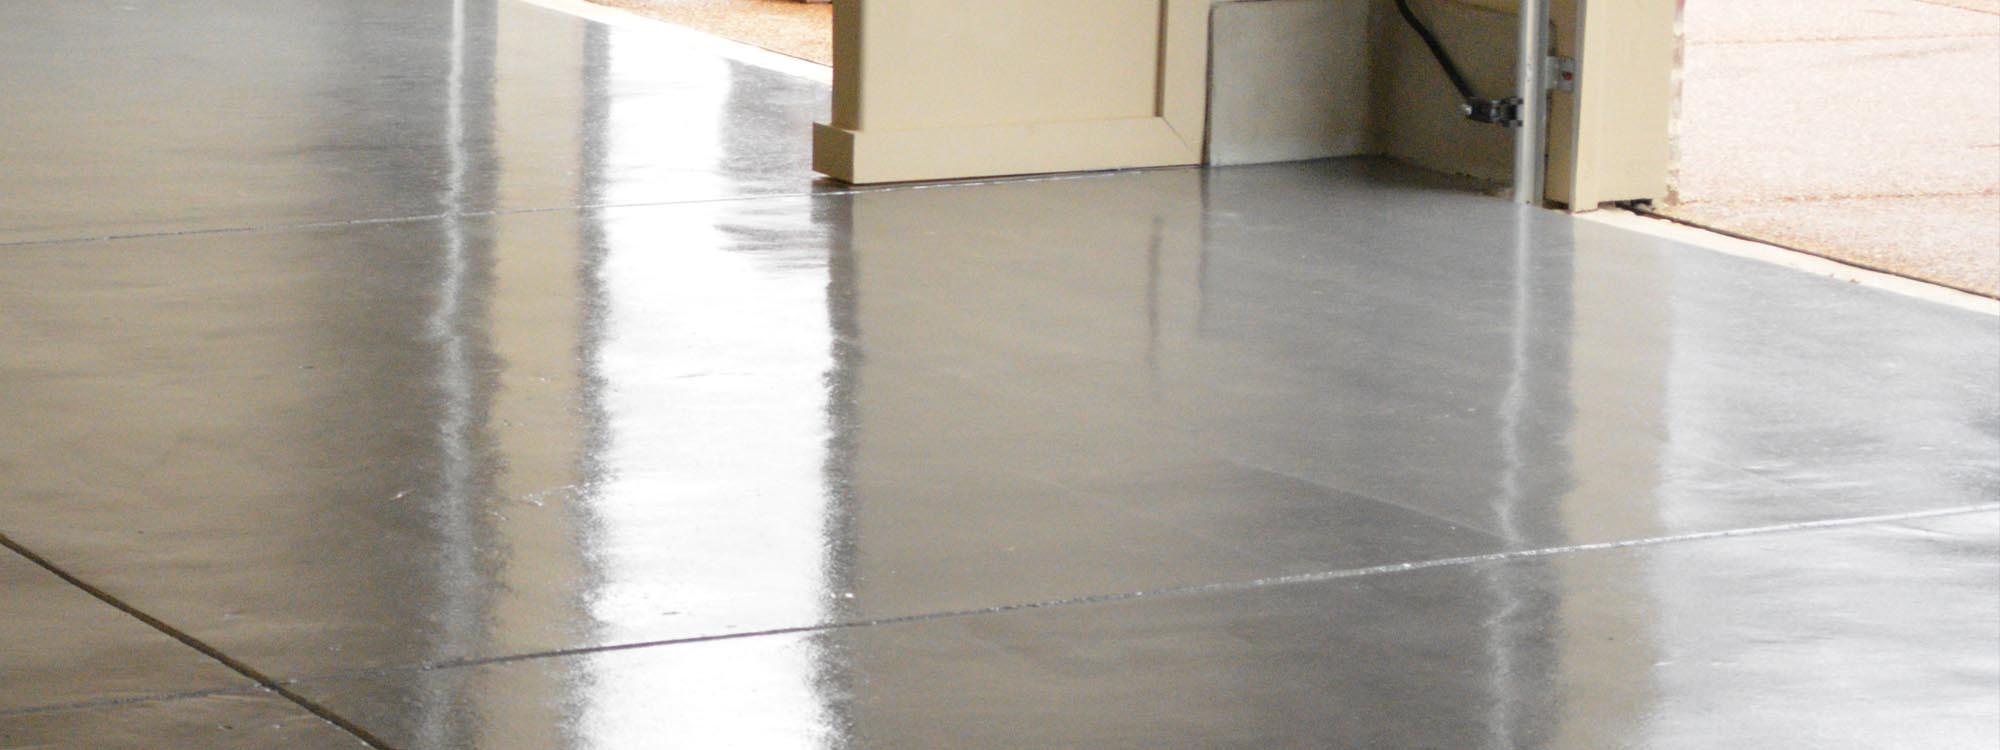 Surfacescapes concrete coatings restoration and concrete for How do you clean concrete garage floor